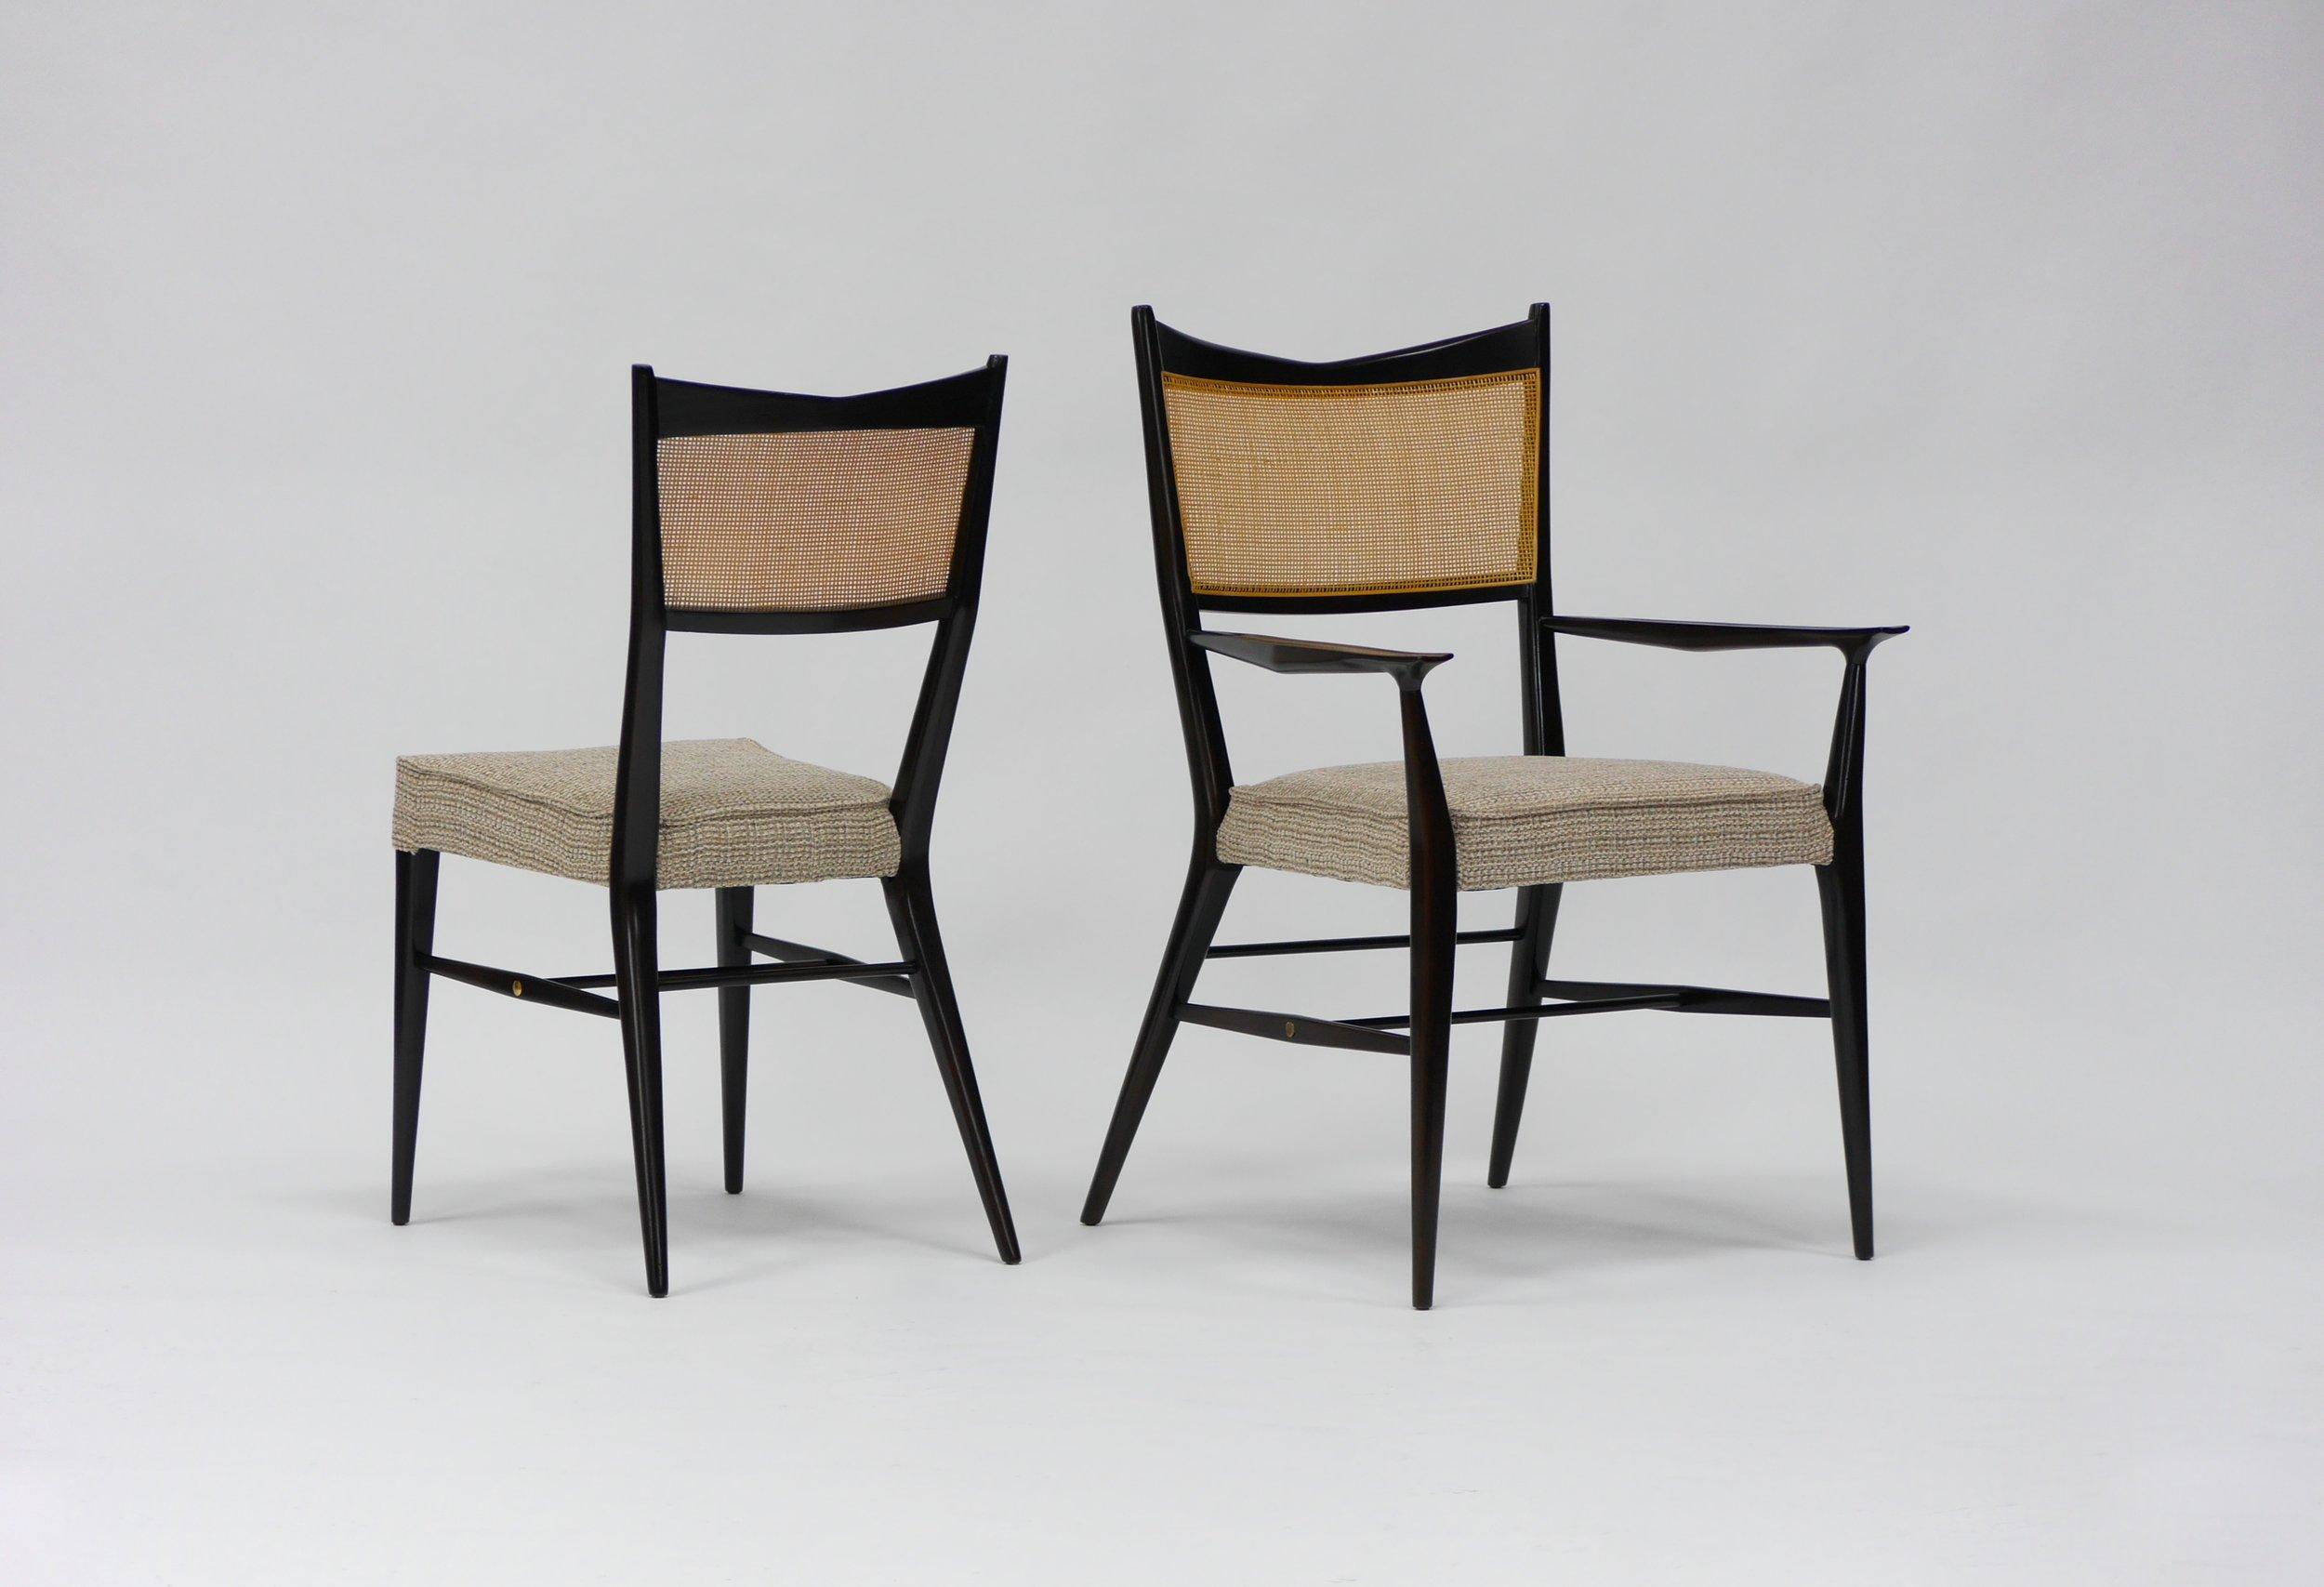 Ten Paul McCobb Irwin Collection Dining Chairs U2014 Continuum 20th Century  Design